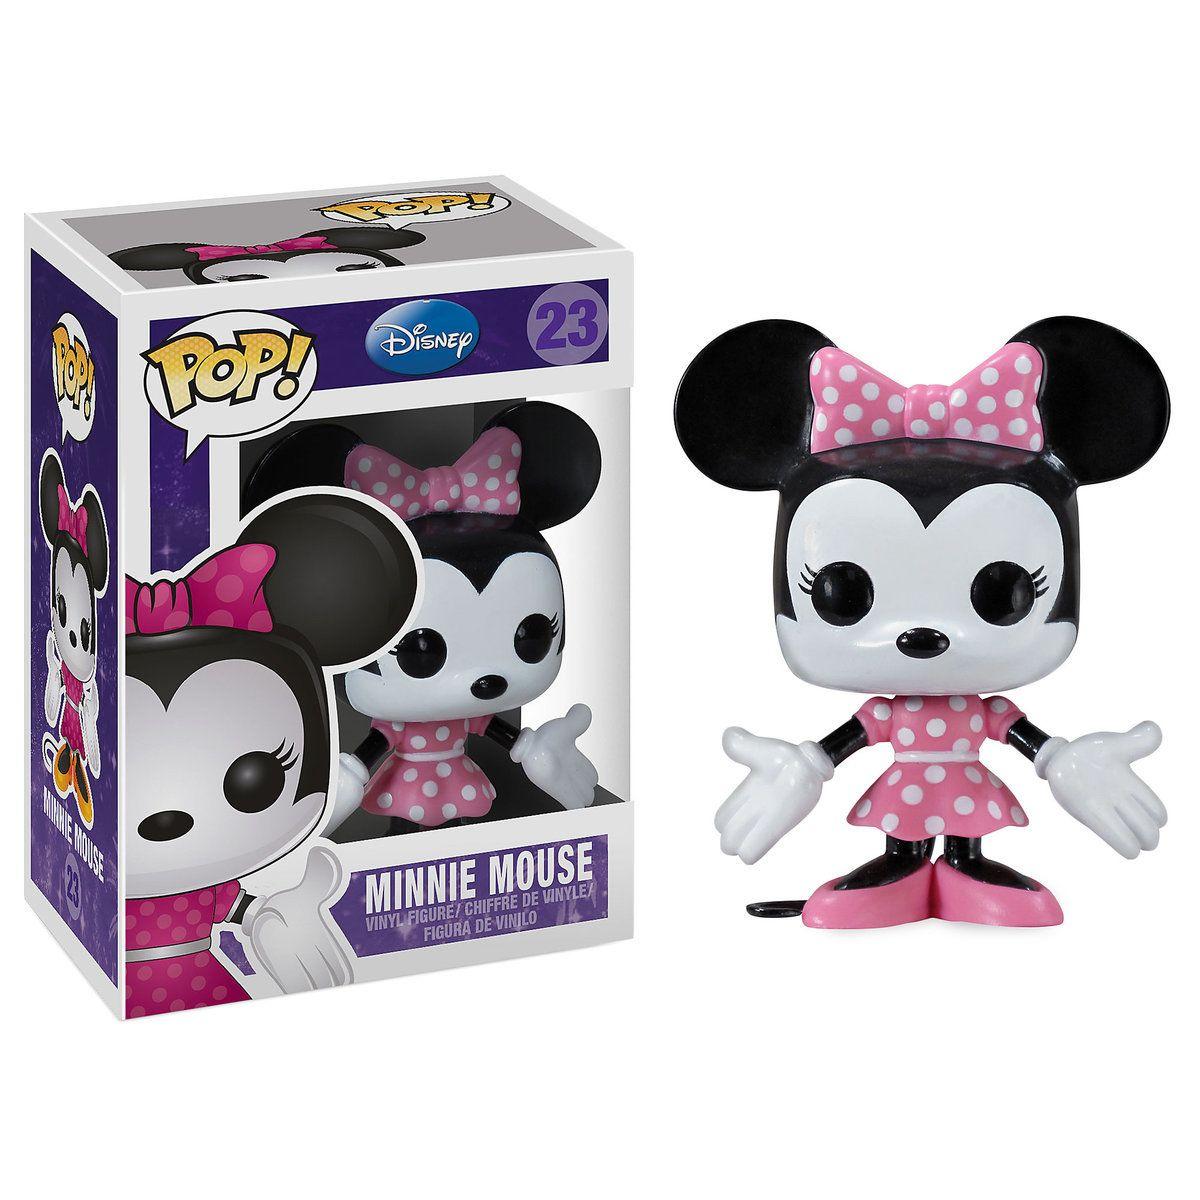 Minnie Mouse Pop Vinyl Figure By Funko Tiendas Disney Figuras Pop Figuras Funko